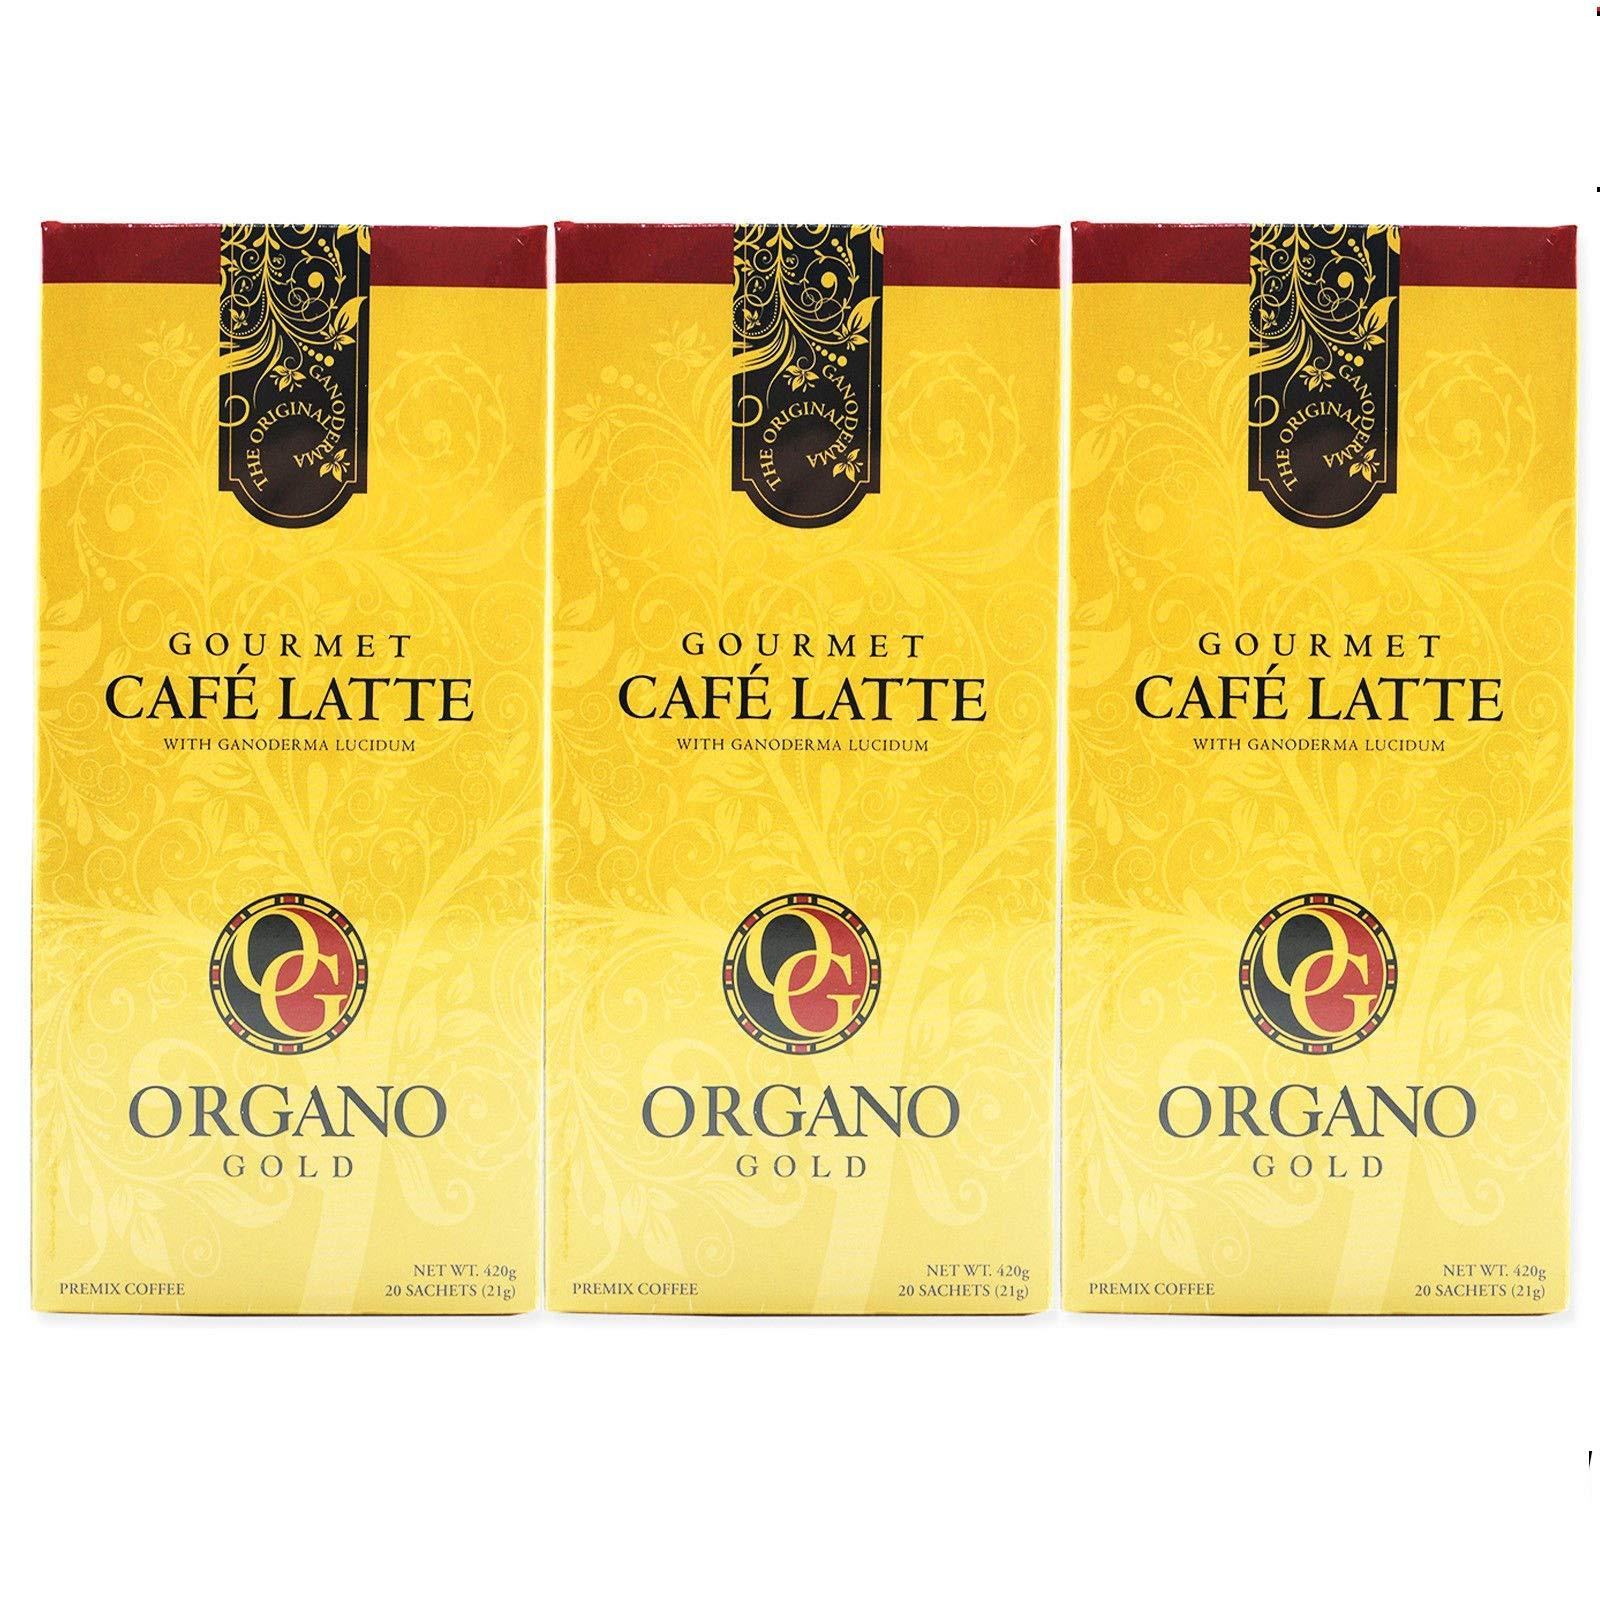 3 Box 100% Certified Organic Organic Ganoderma Gourmet Organo Gold Cafe Latte Offer Free Express by Organo Gold